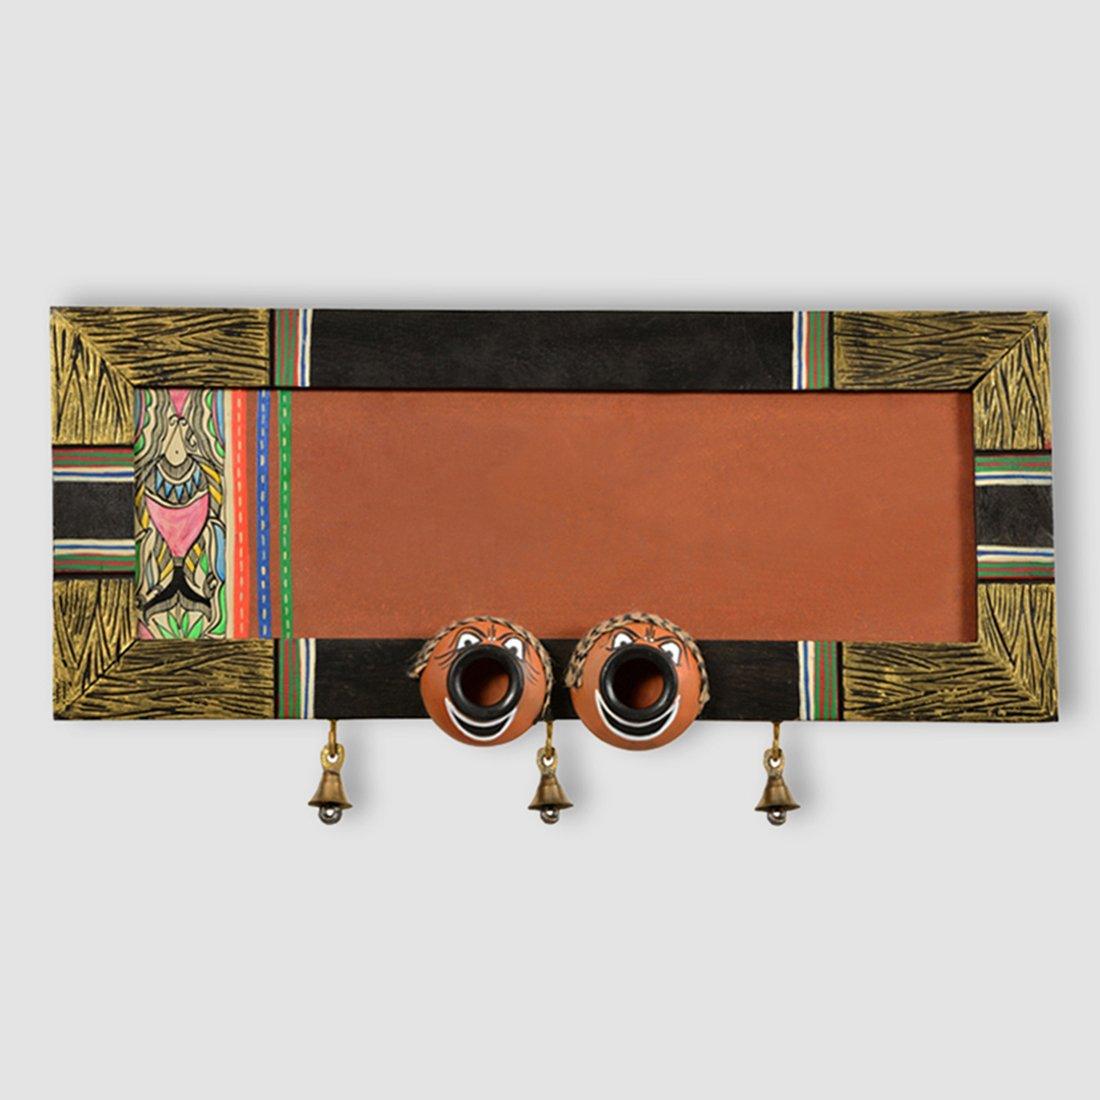 ExclusiveLane Nazar Battu Plain Name Plate With Madhubani Art-Showpiece Front Gate DÃcor Door Name Plates Wall Hanging